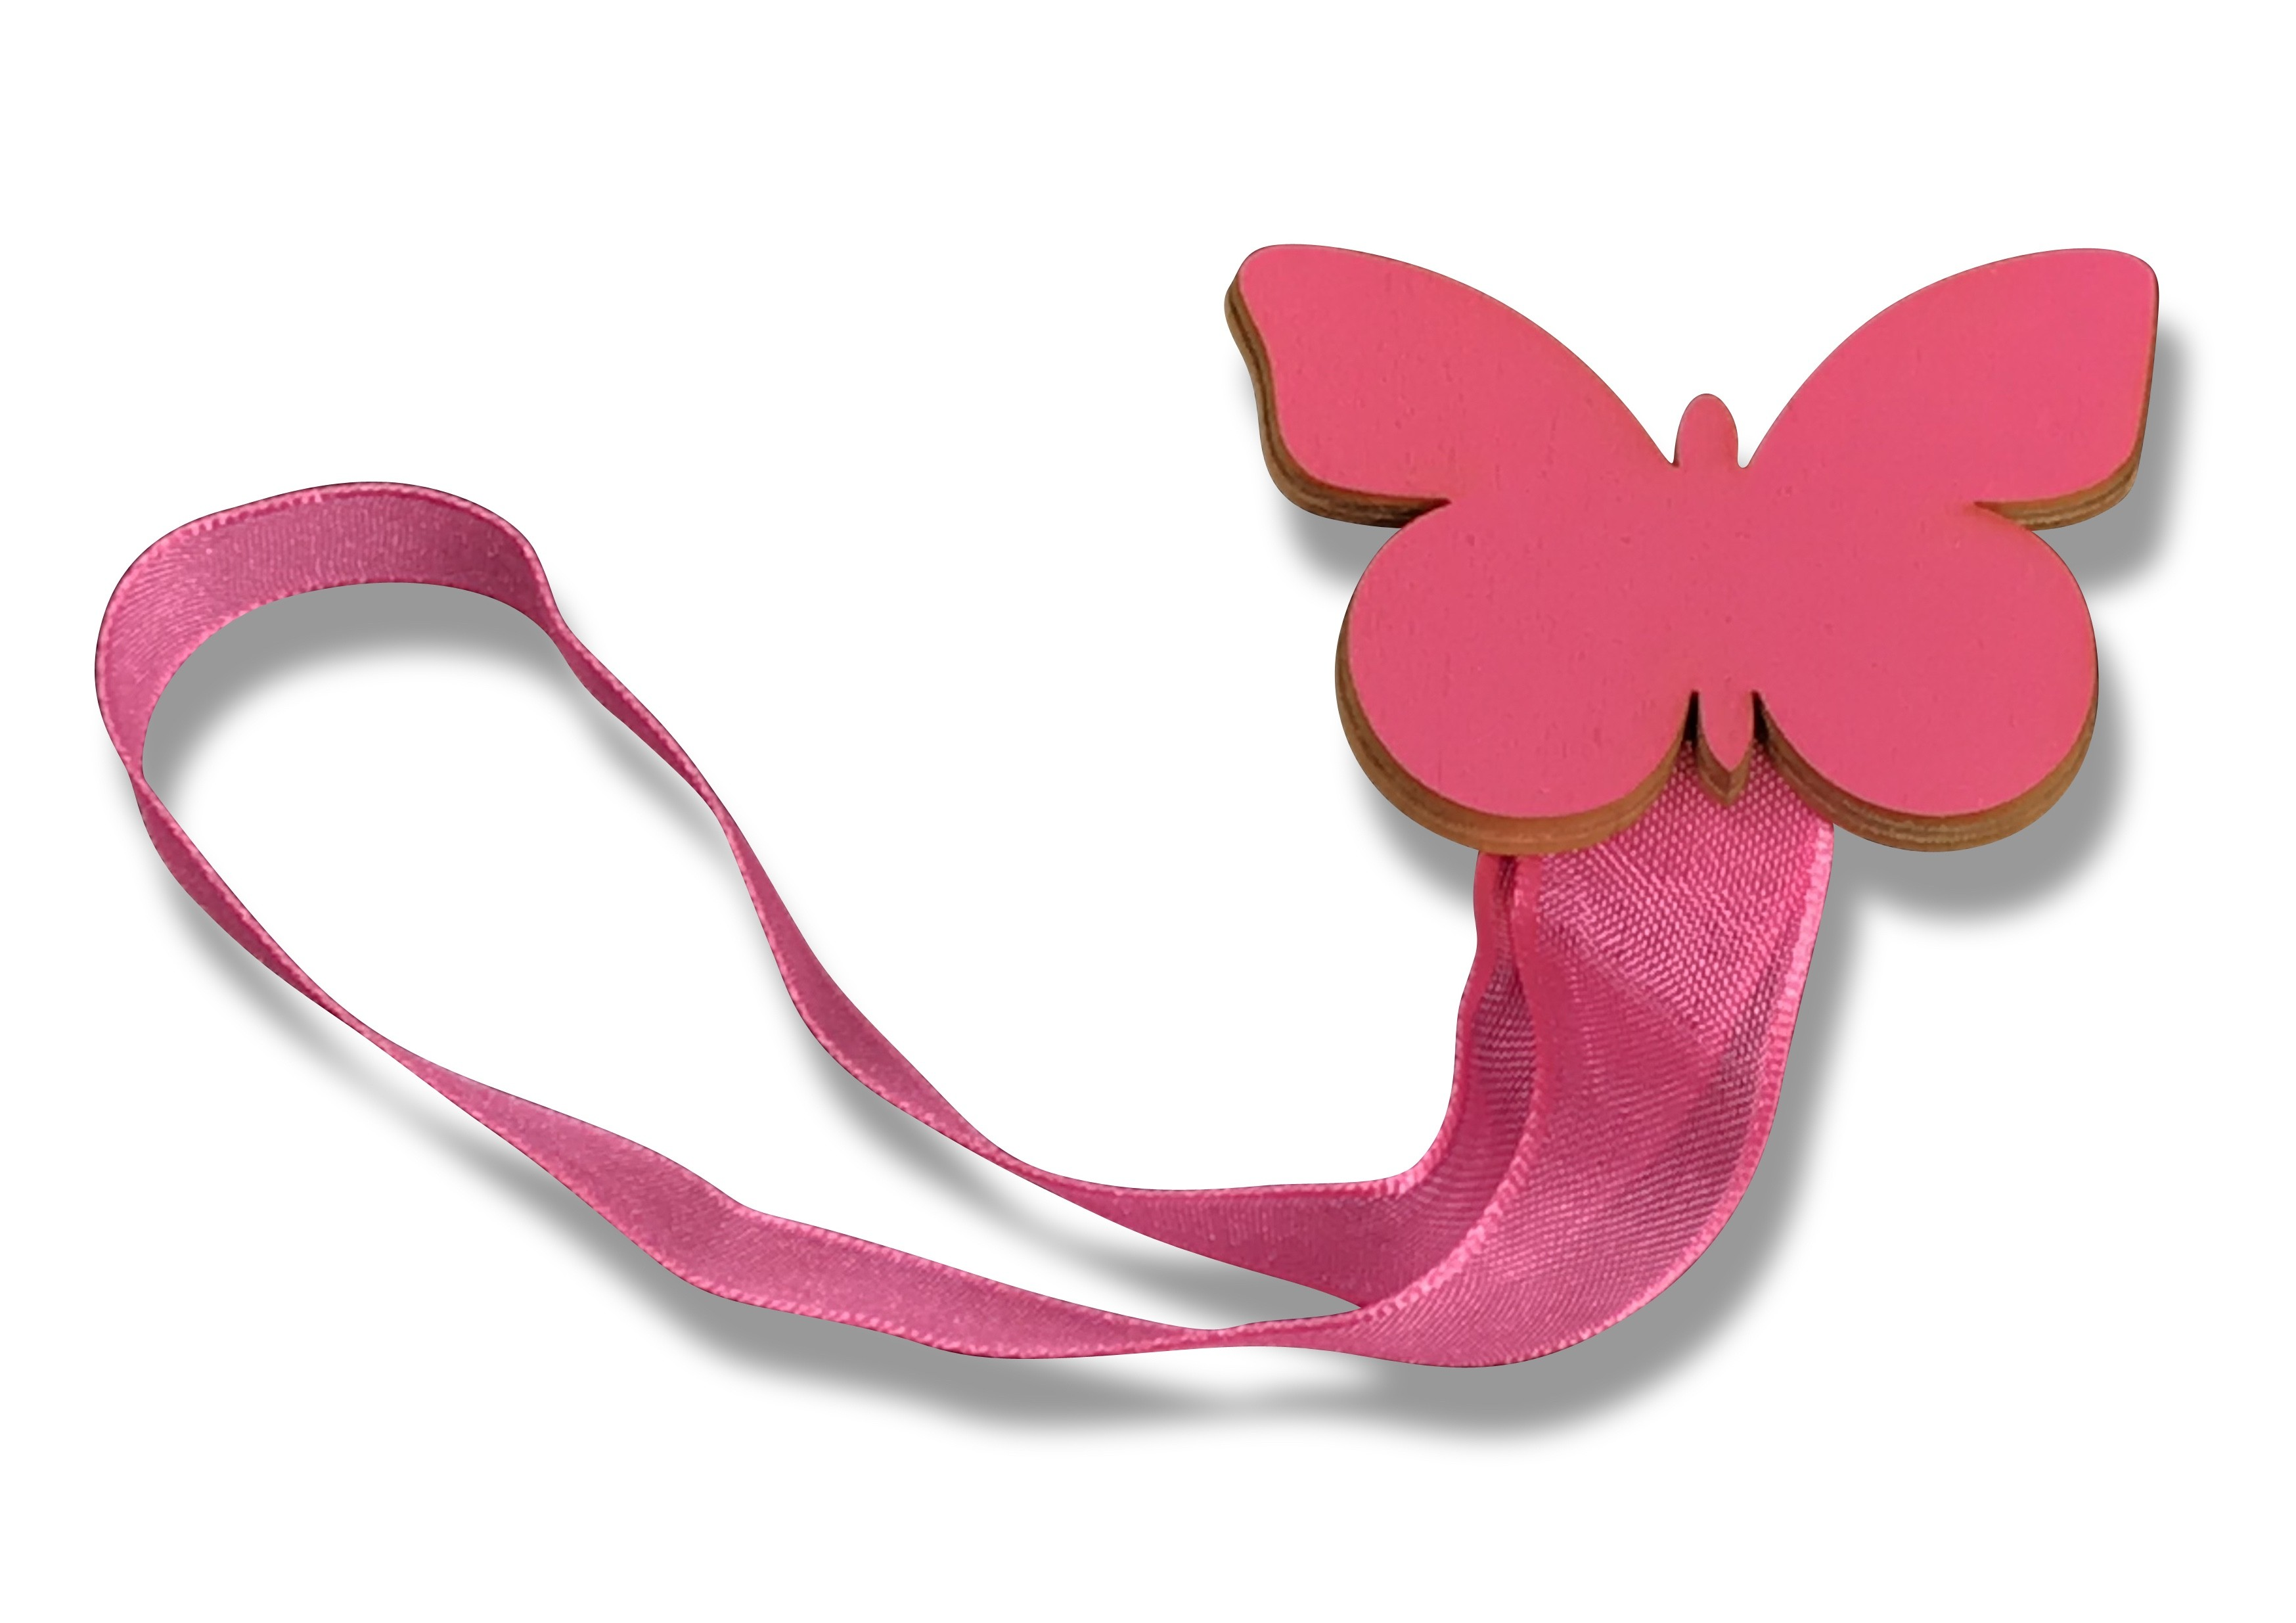 Calamita ferma tenda farfalla rosa calamite per tende fermatende